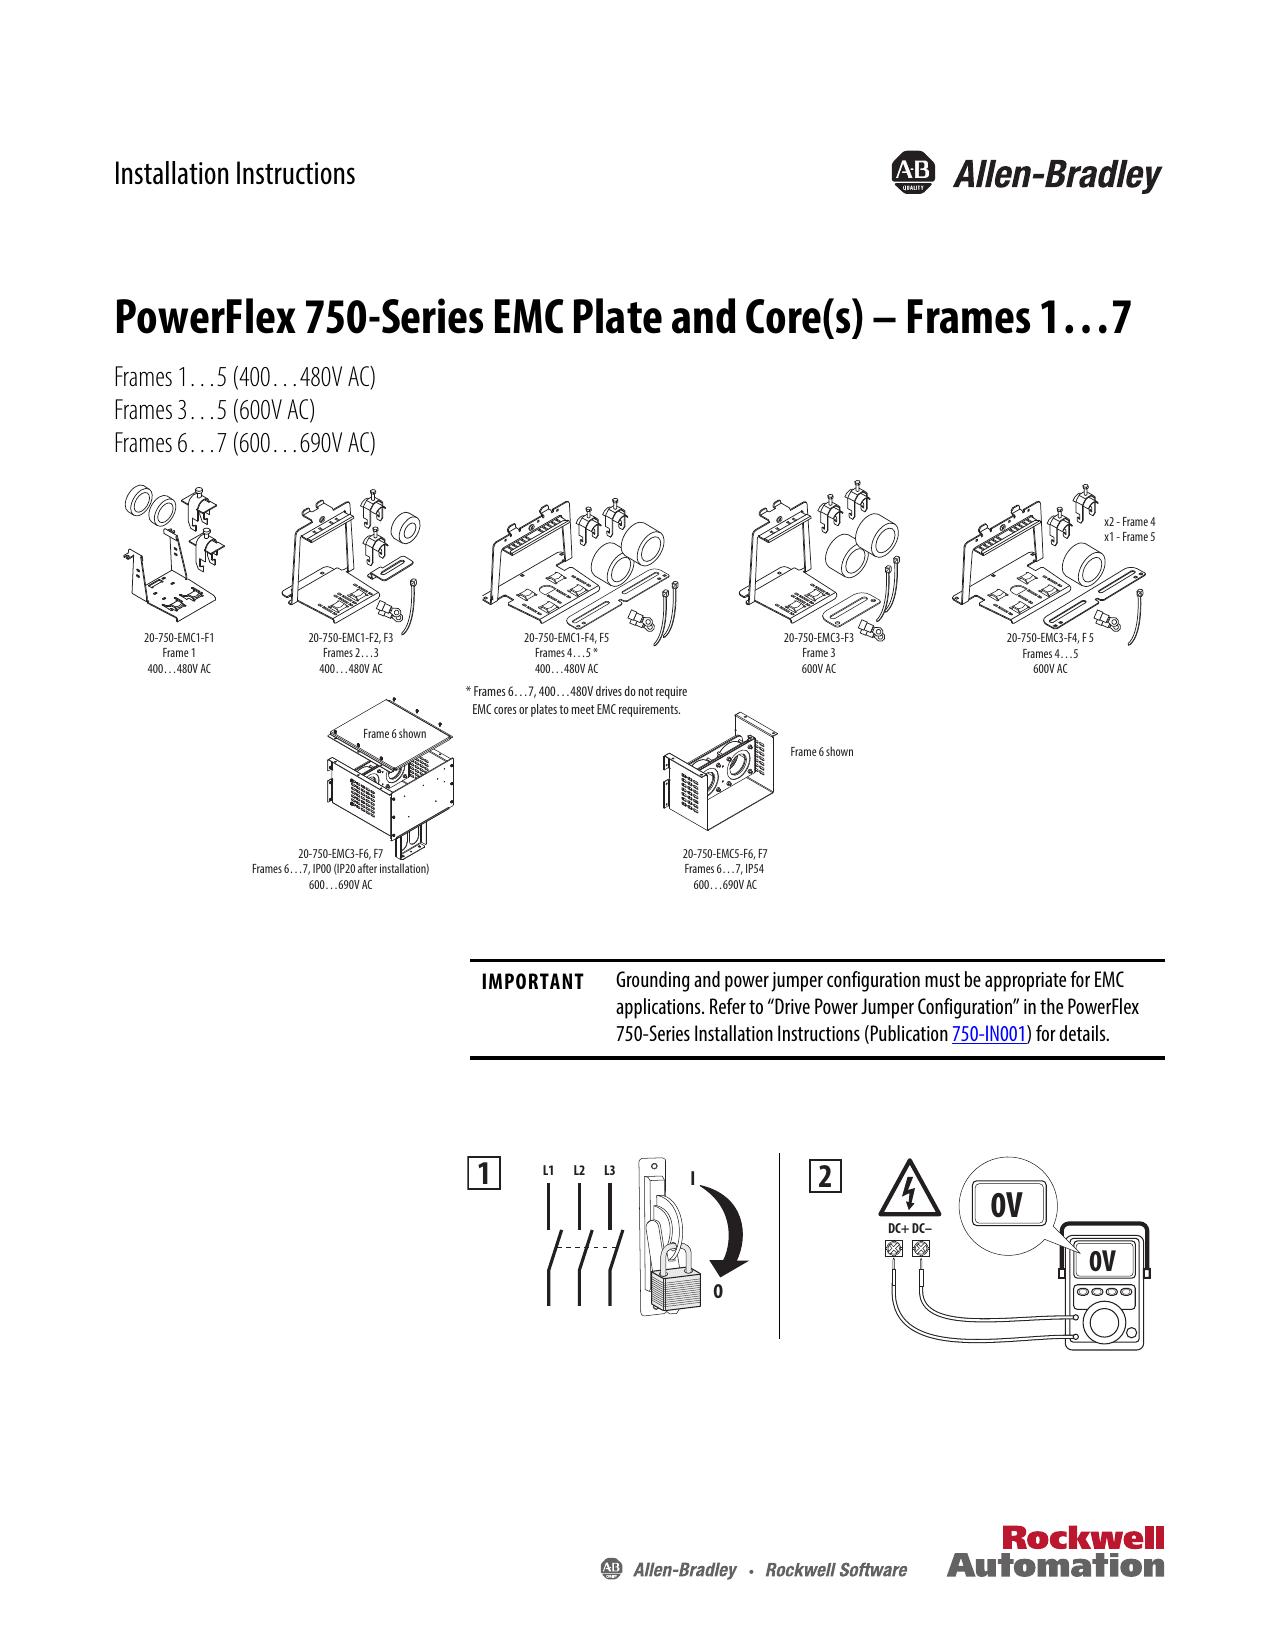 powerflex 753 wiring diagram powerflex 400 wiring diagram diagram data querry  powerflex 400 wiring diagram diagram